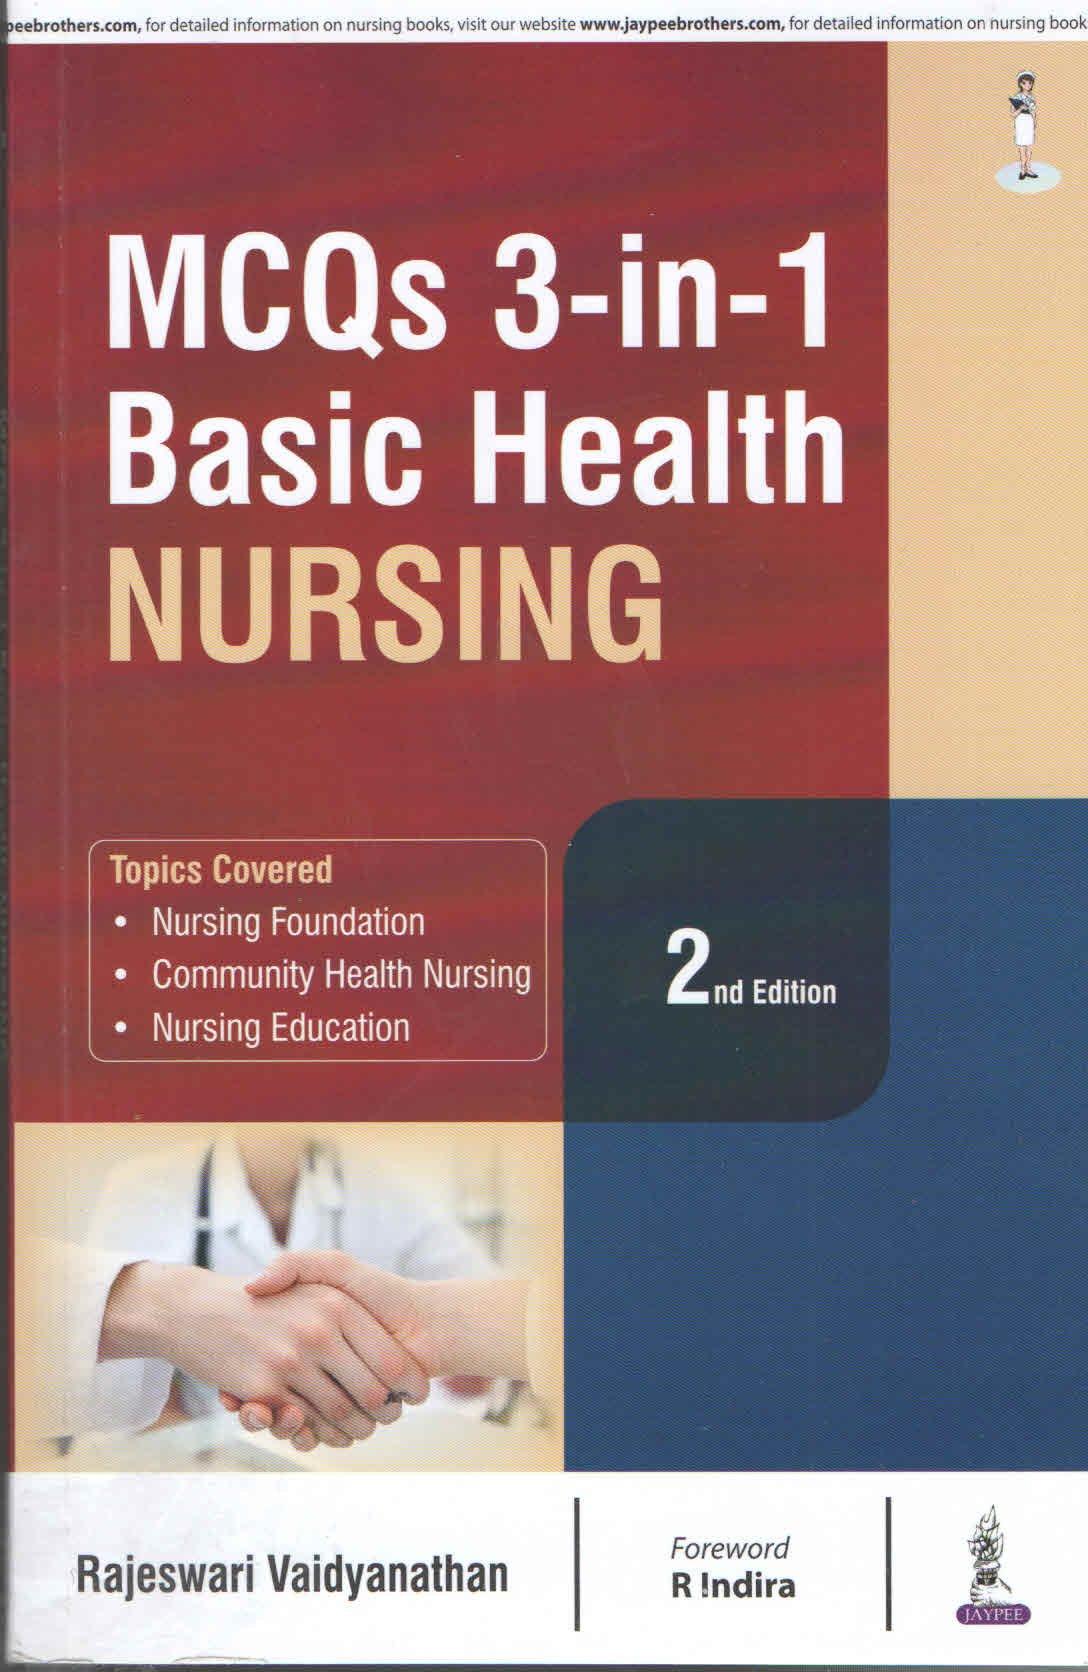 mcq nursing education